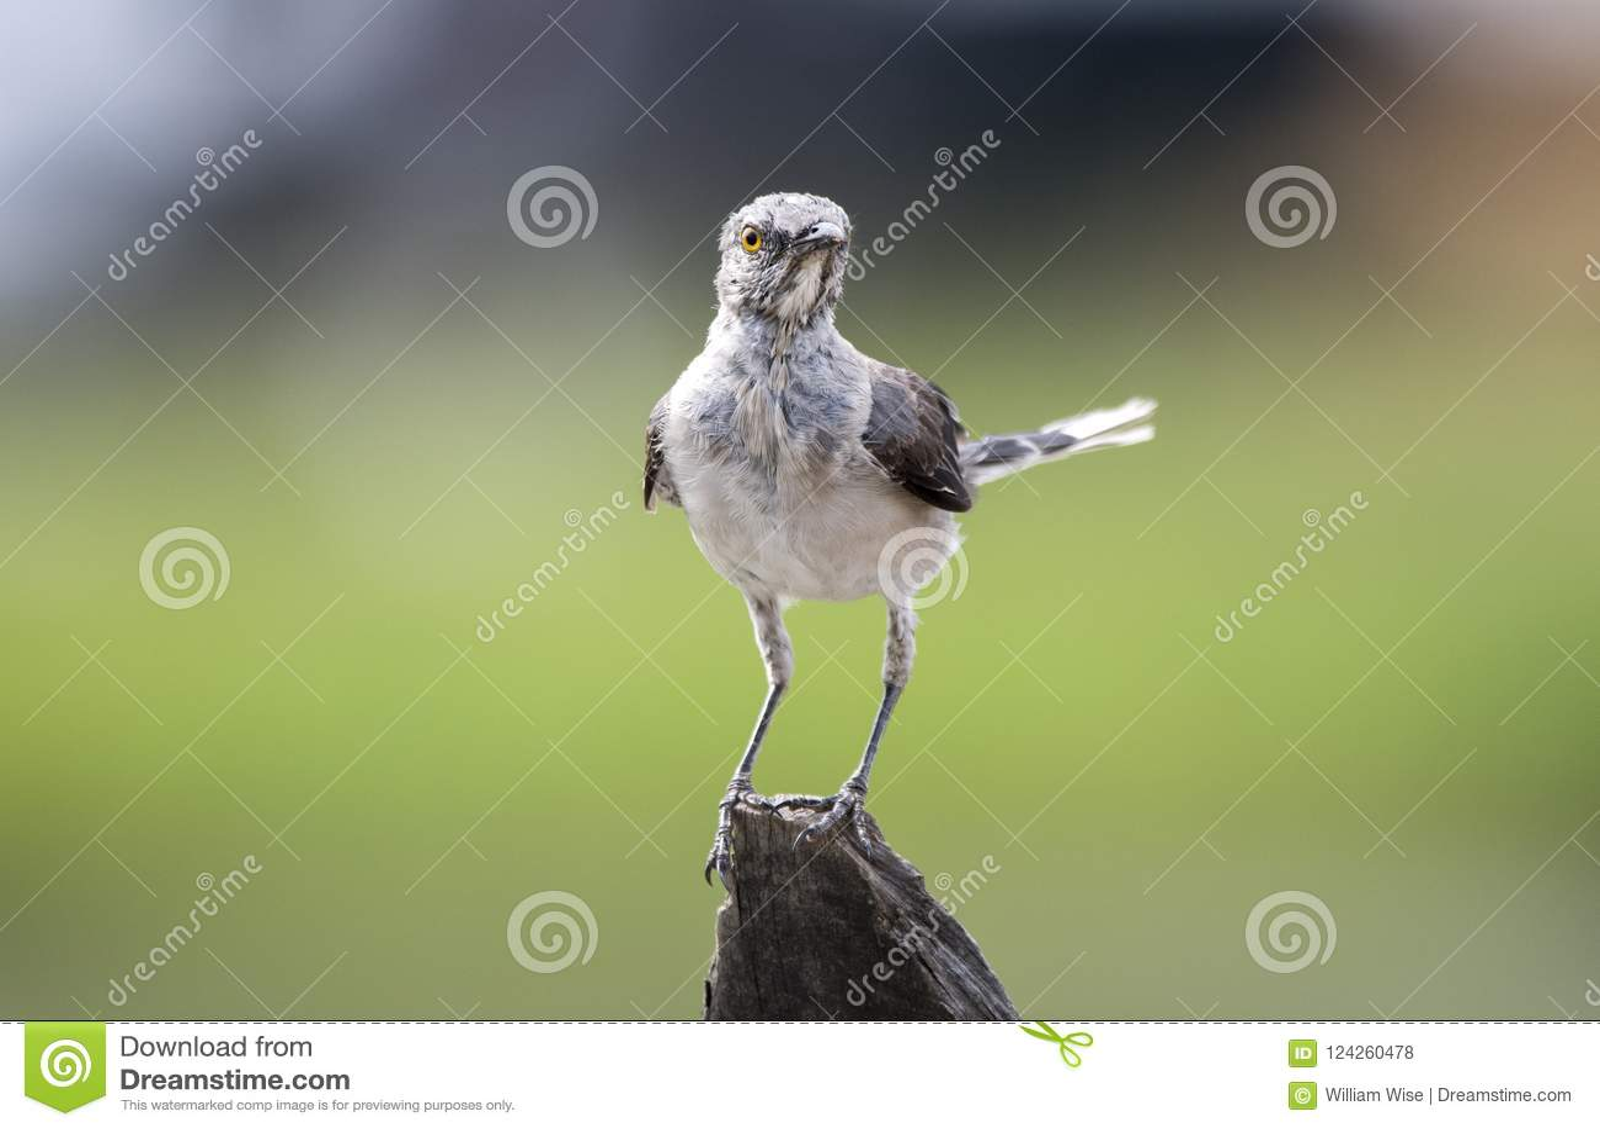 Barnslig nordlig härmfågelruggning, Georgia USA